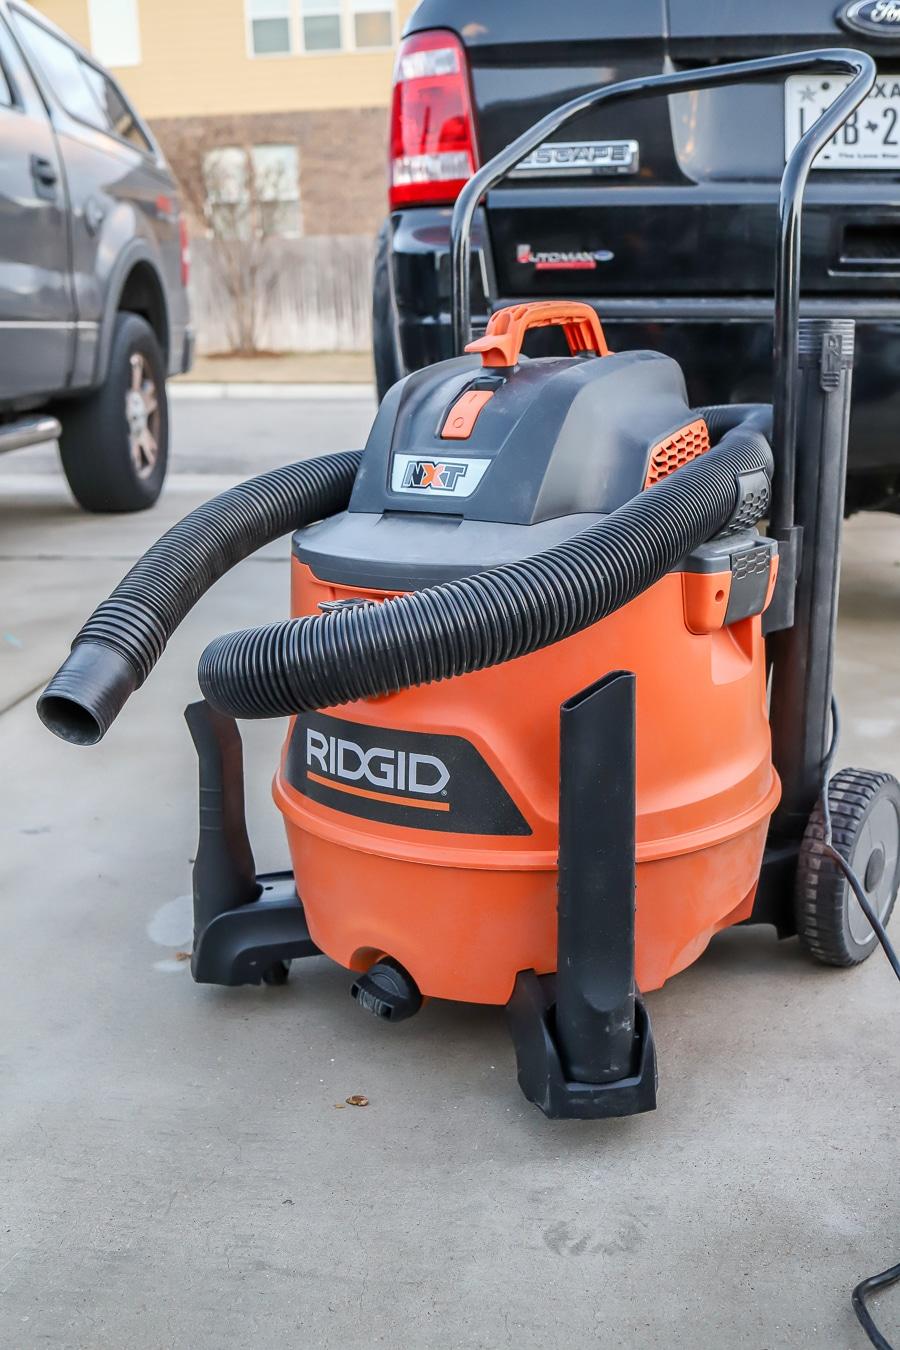 Ridgid wet dry vacuum tool review